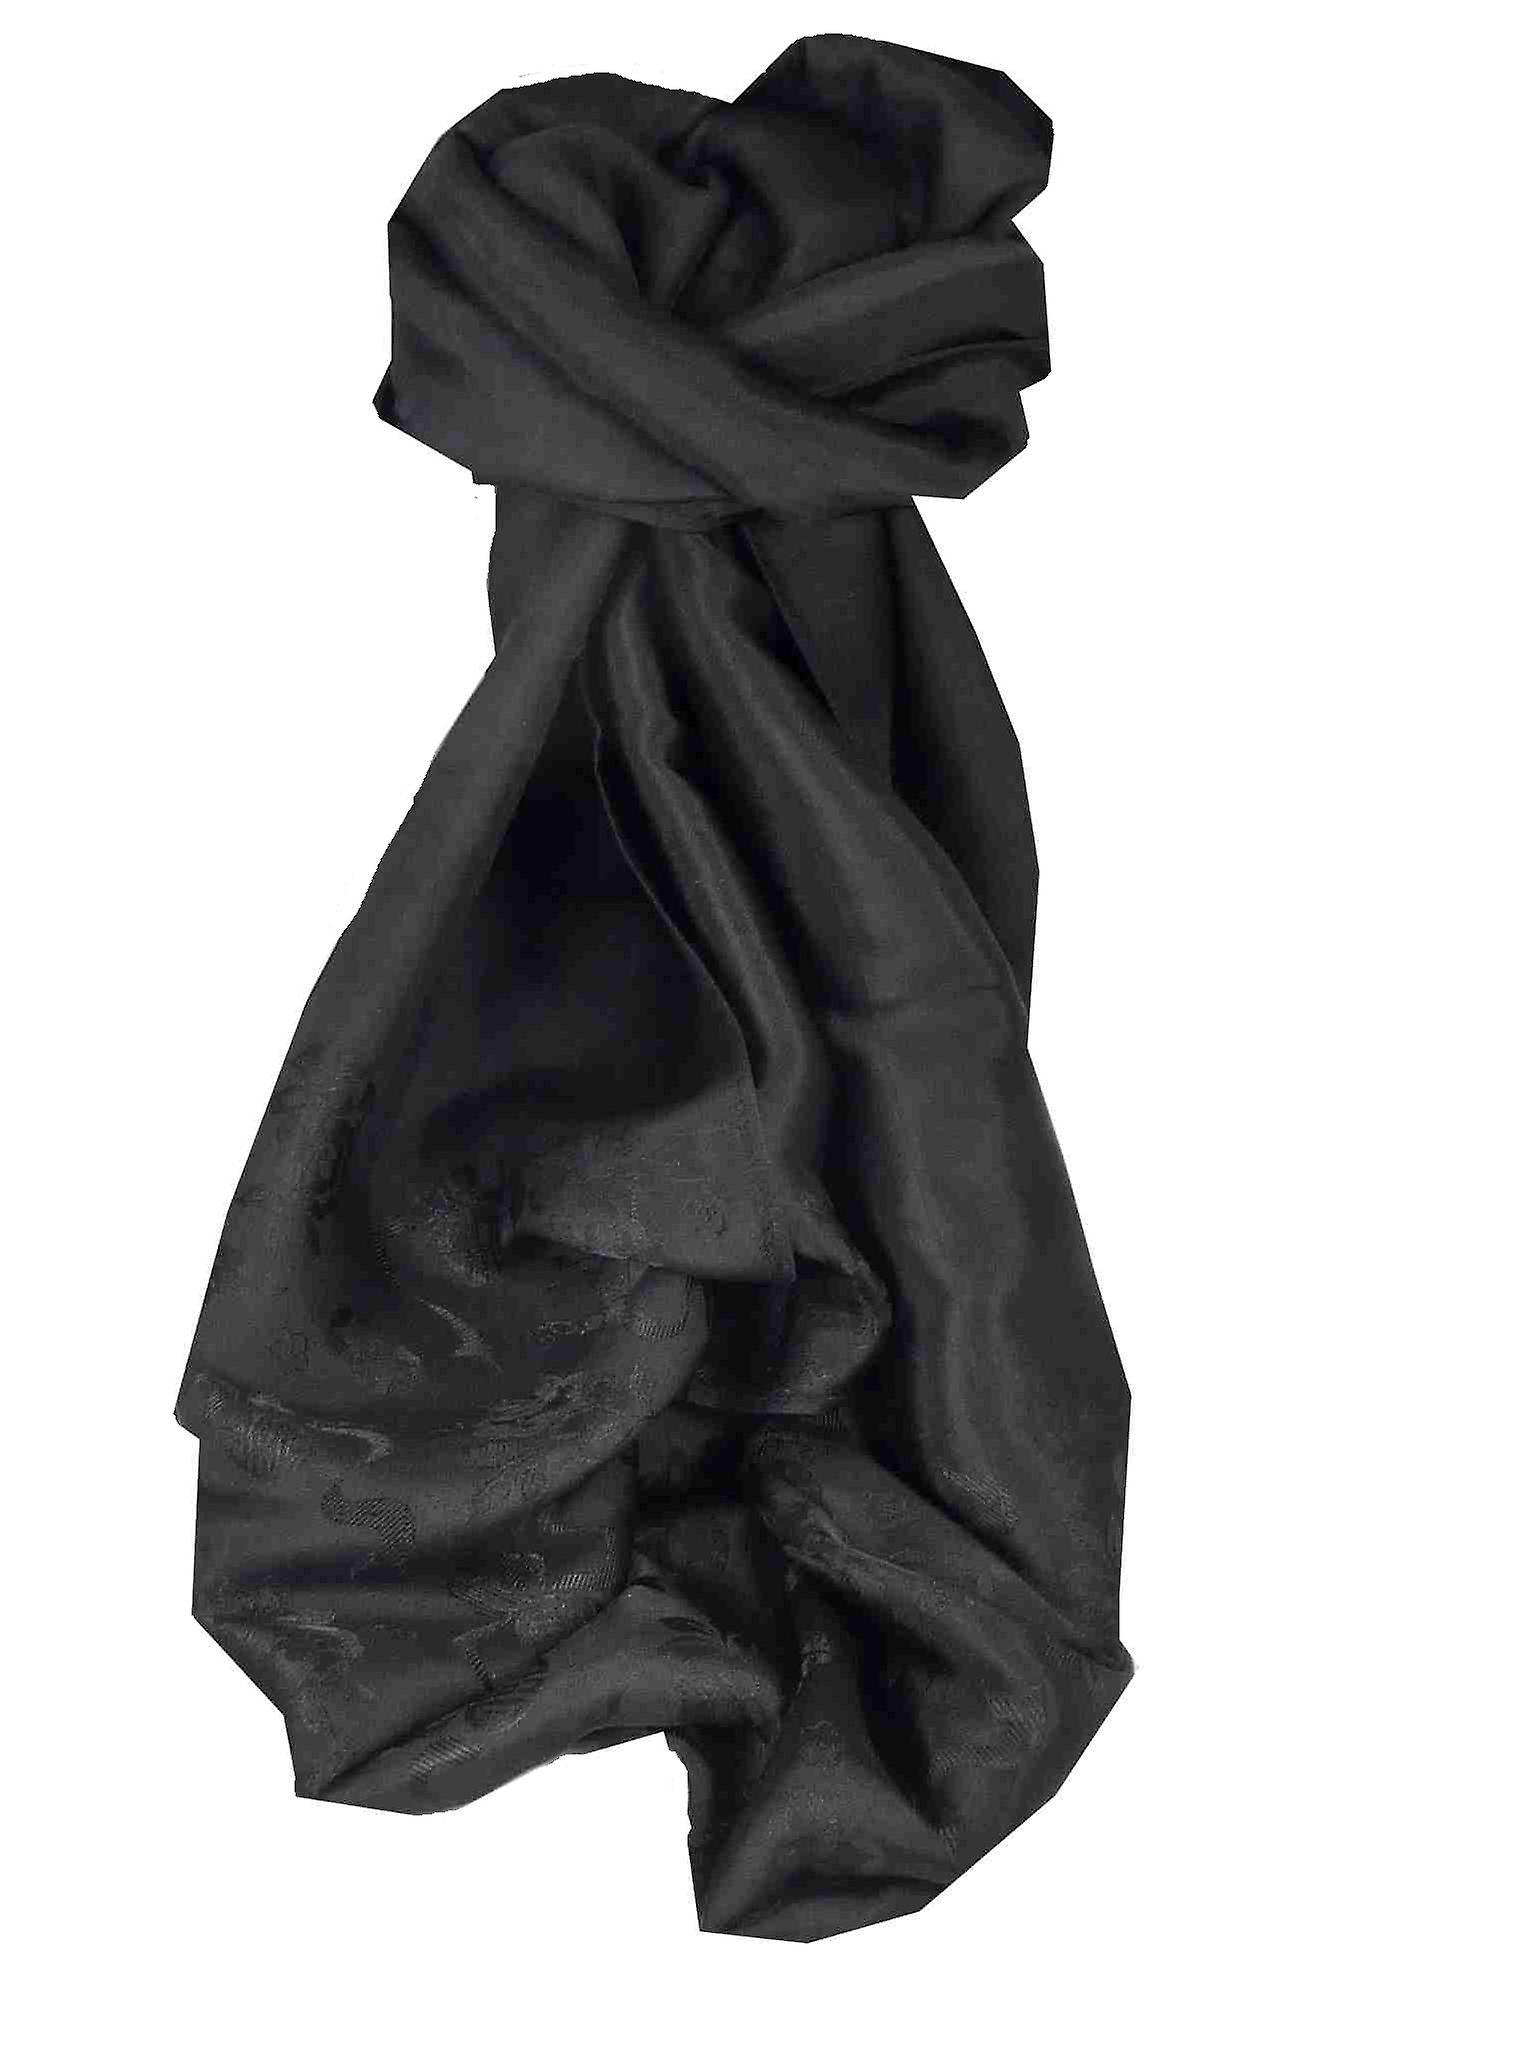 Vietnamese Silk Scarf Reversible Hoi-An Dong-Ha Black by Pashmina & Silk